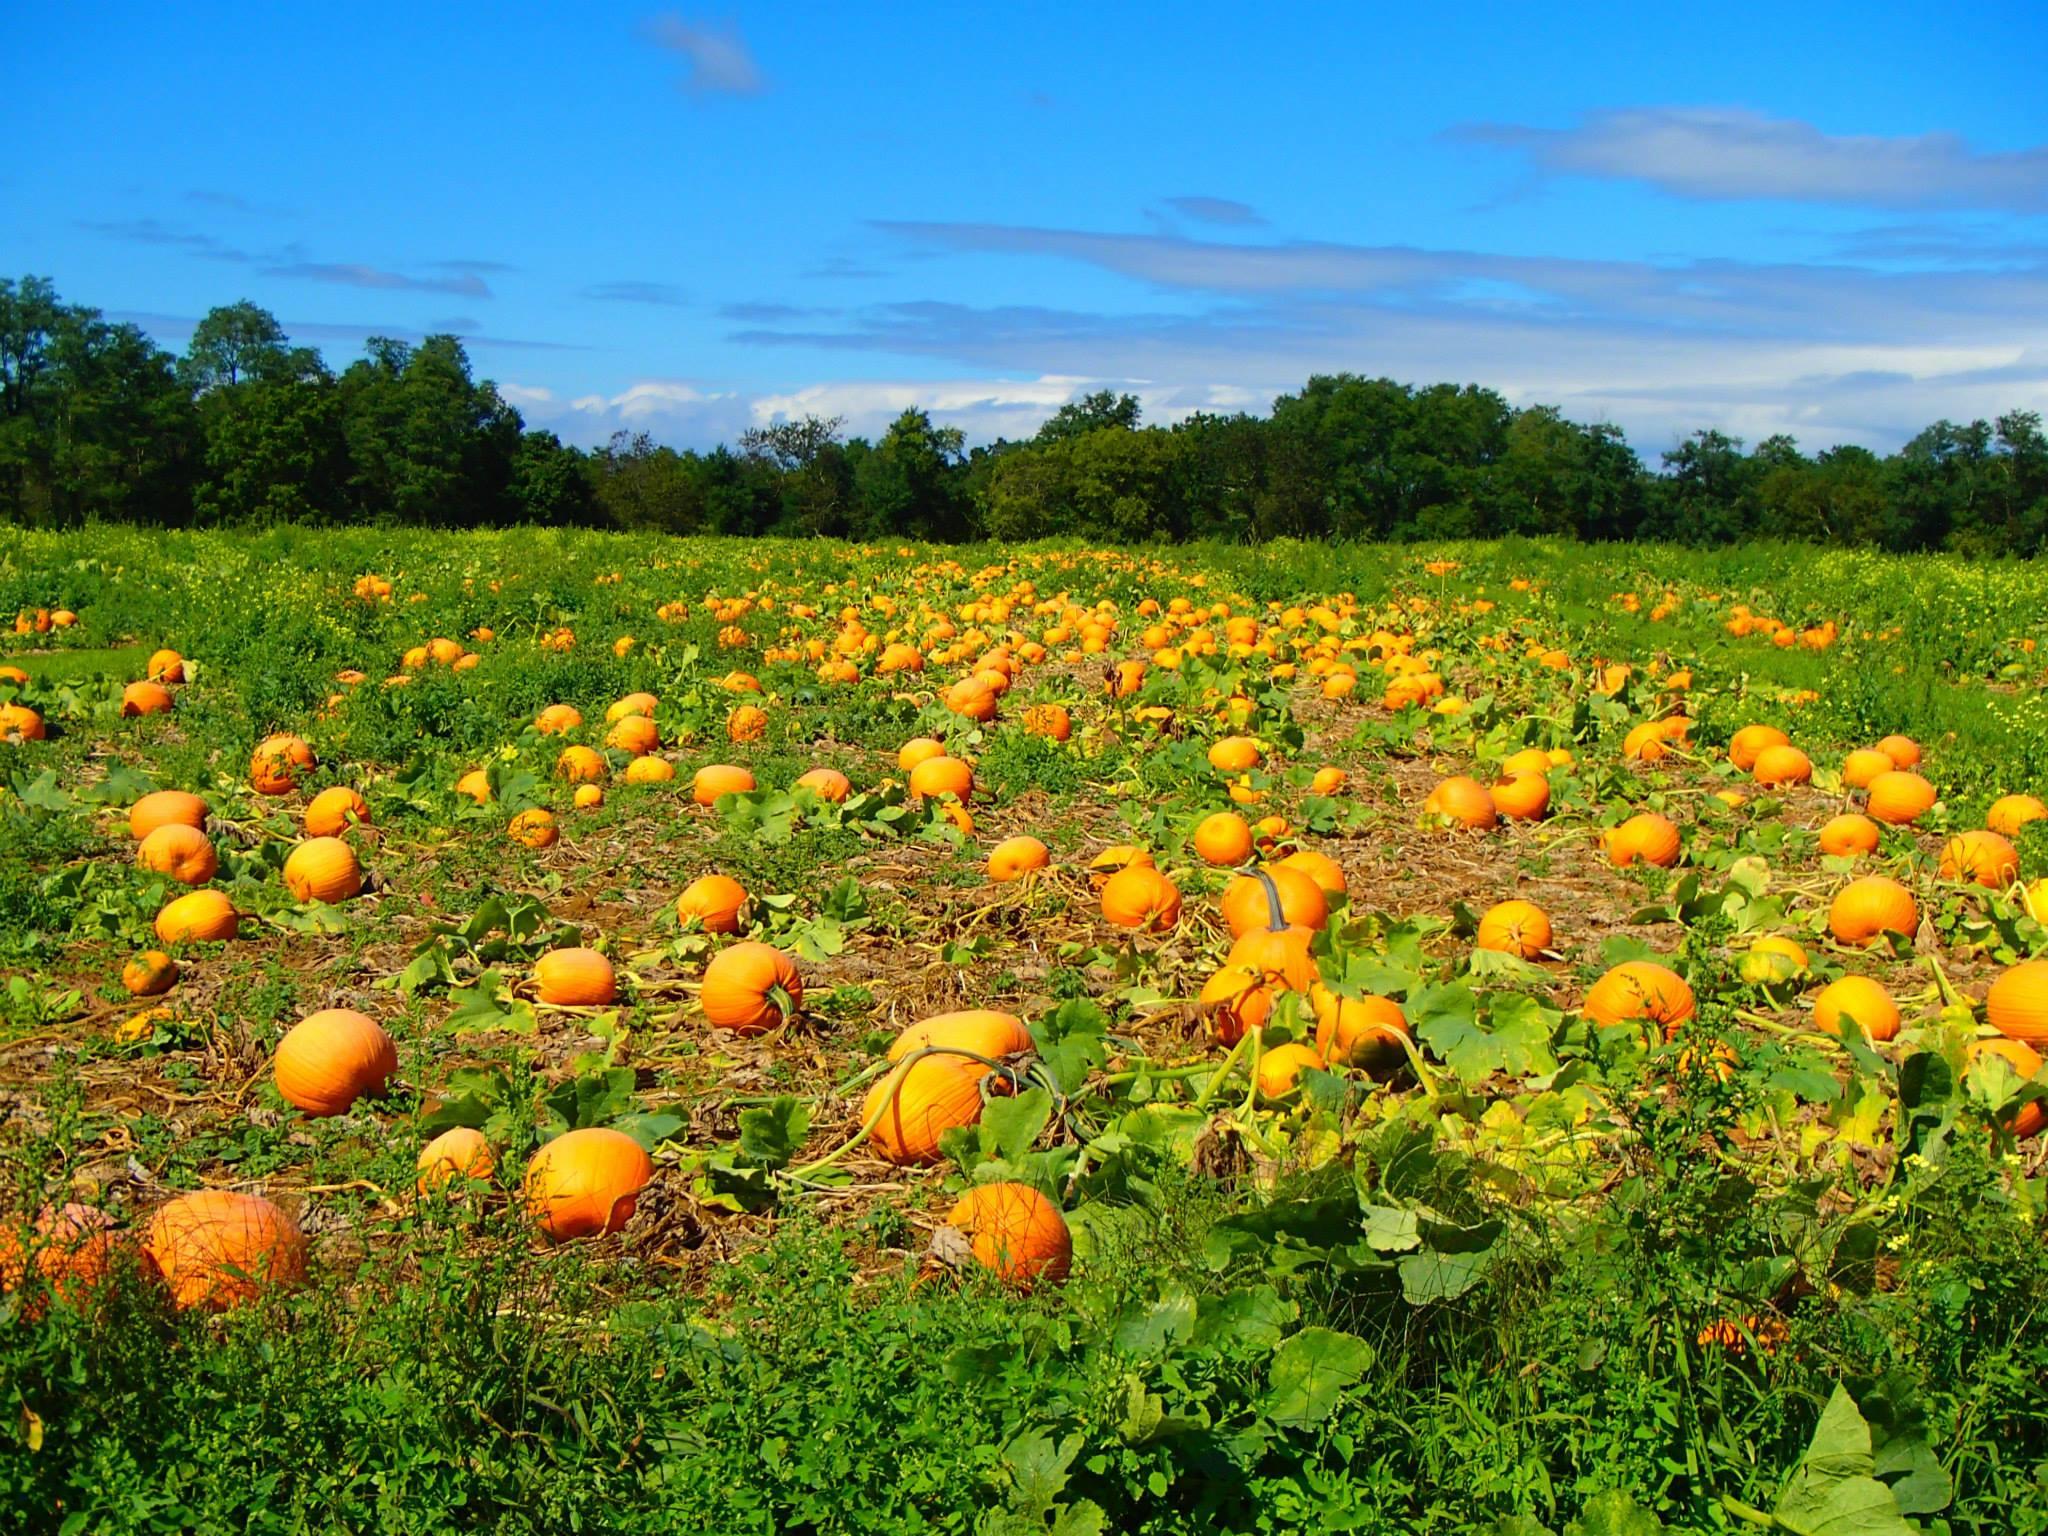 Farm In Long Island For Pumpkin Picking